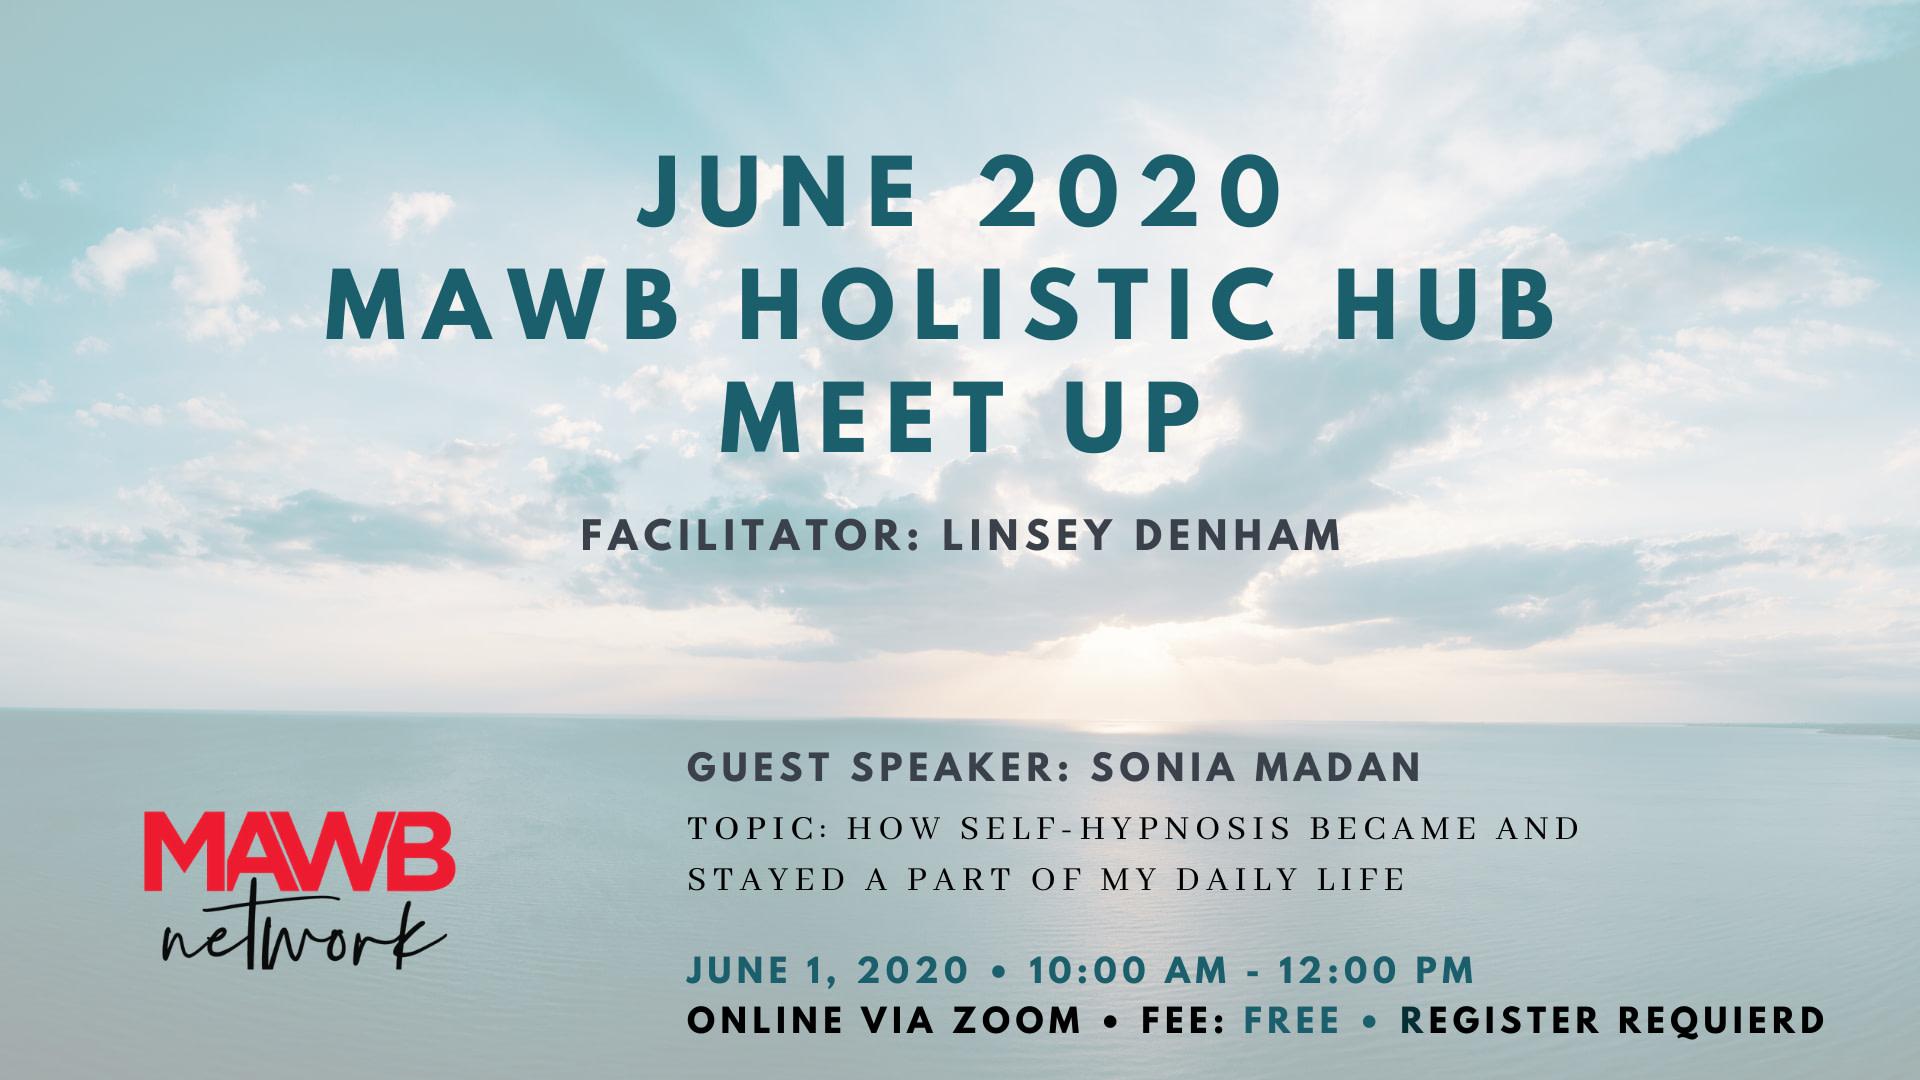 MAWB Holistic Hub - June Meet Up